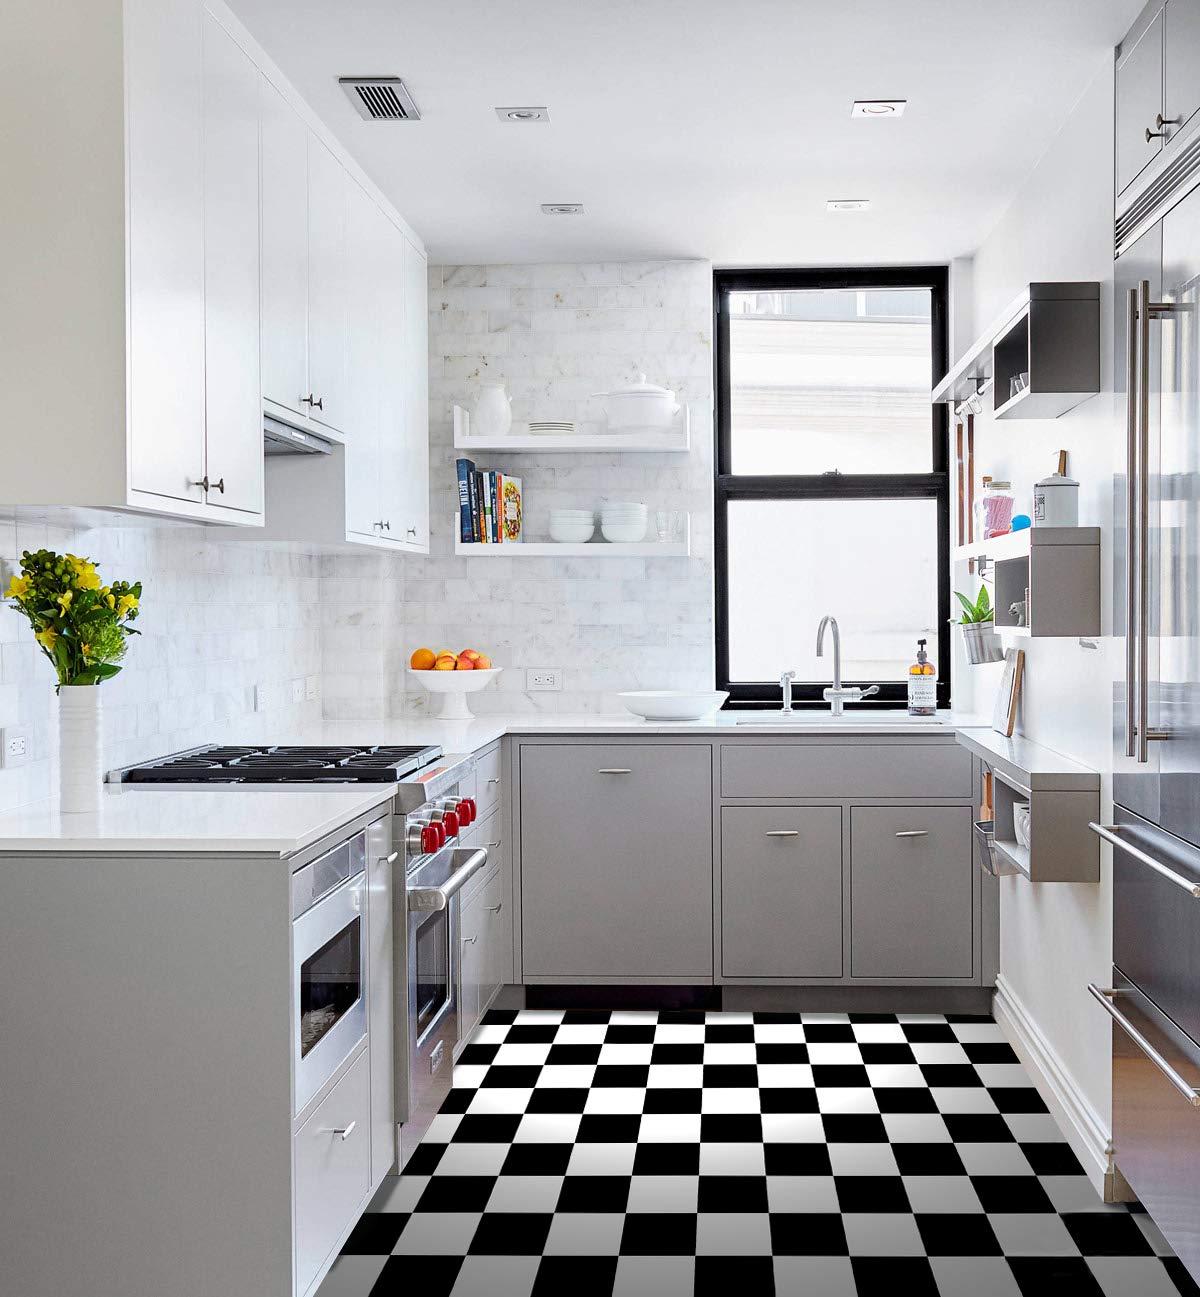 Raphael Rozen Vinyl Floor Tile' 12 by 12-Inch,Checkered Black and White Tile, Pack of 20